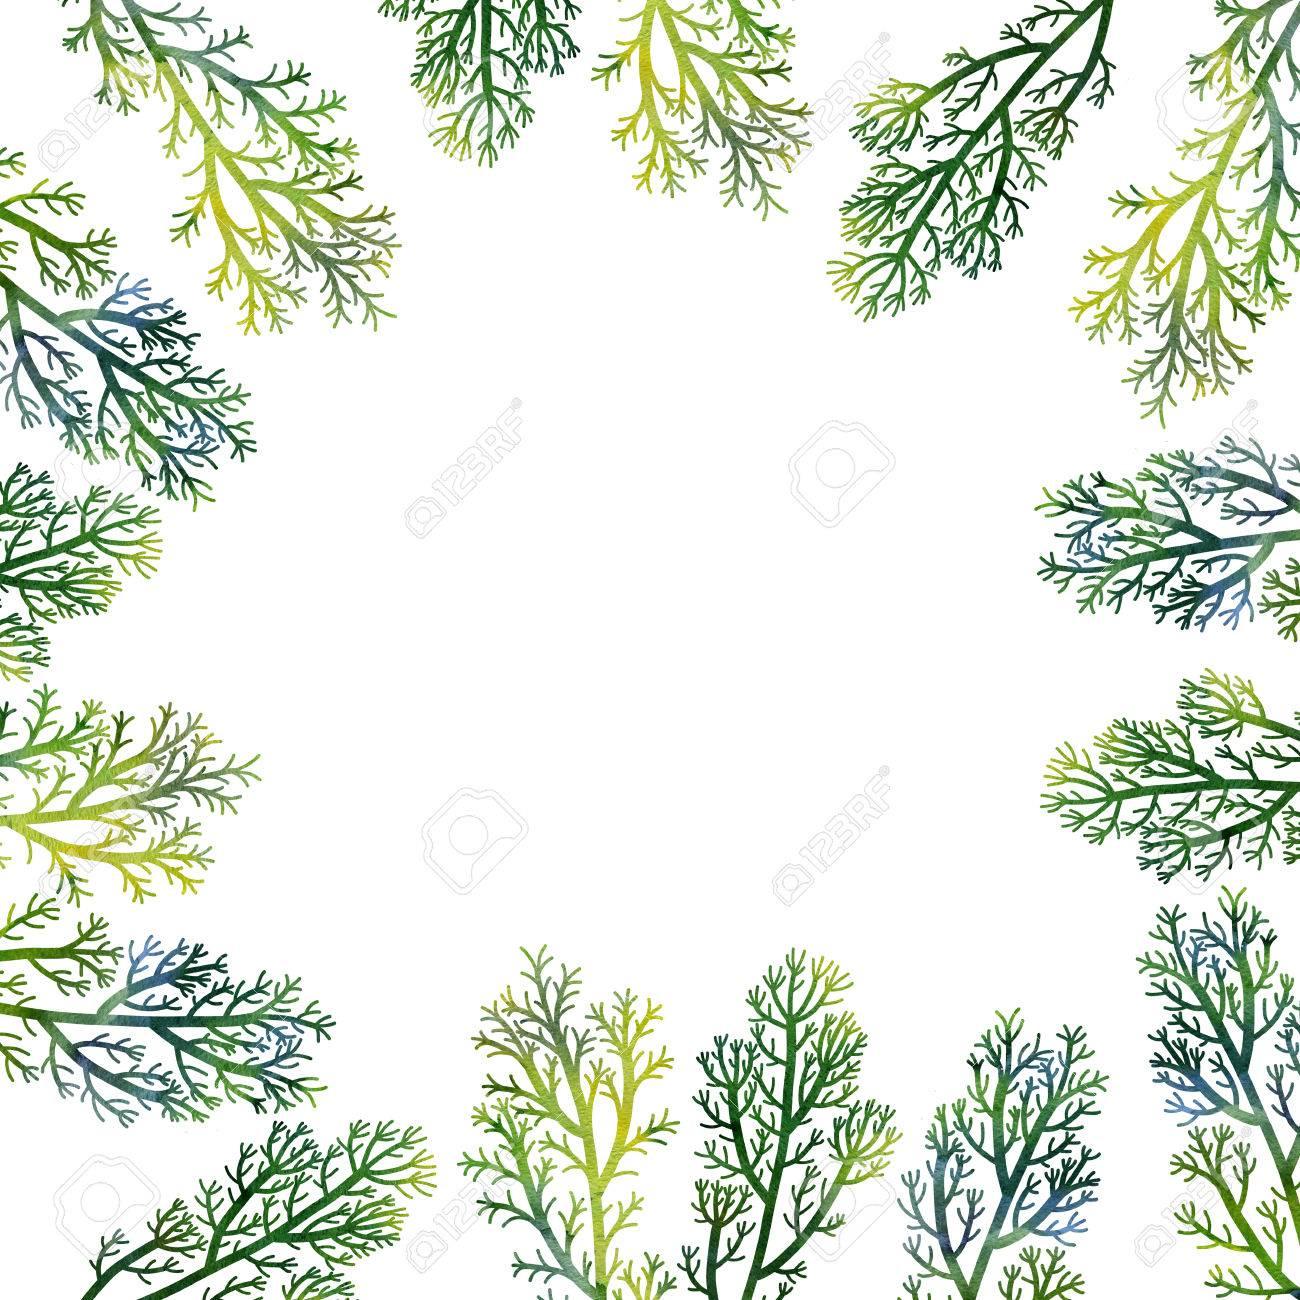 Silueta Composicion Floral Con Plantas Silvestres Dibujo En Acuarela